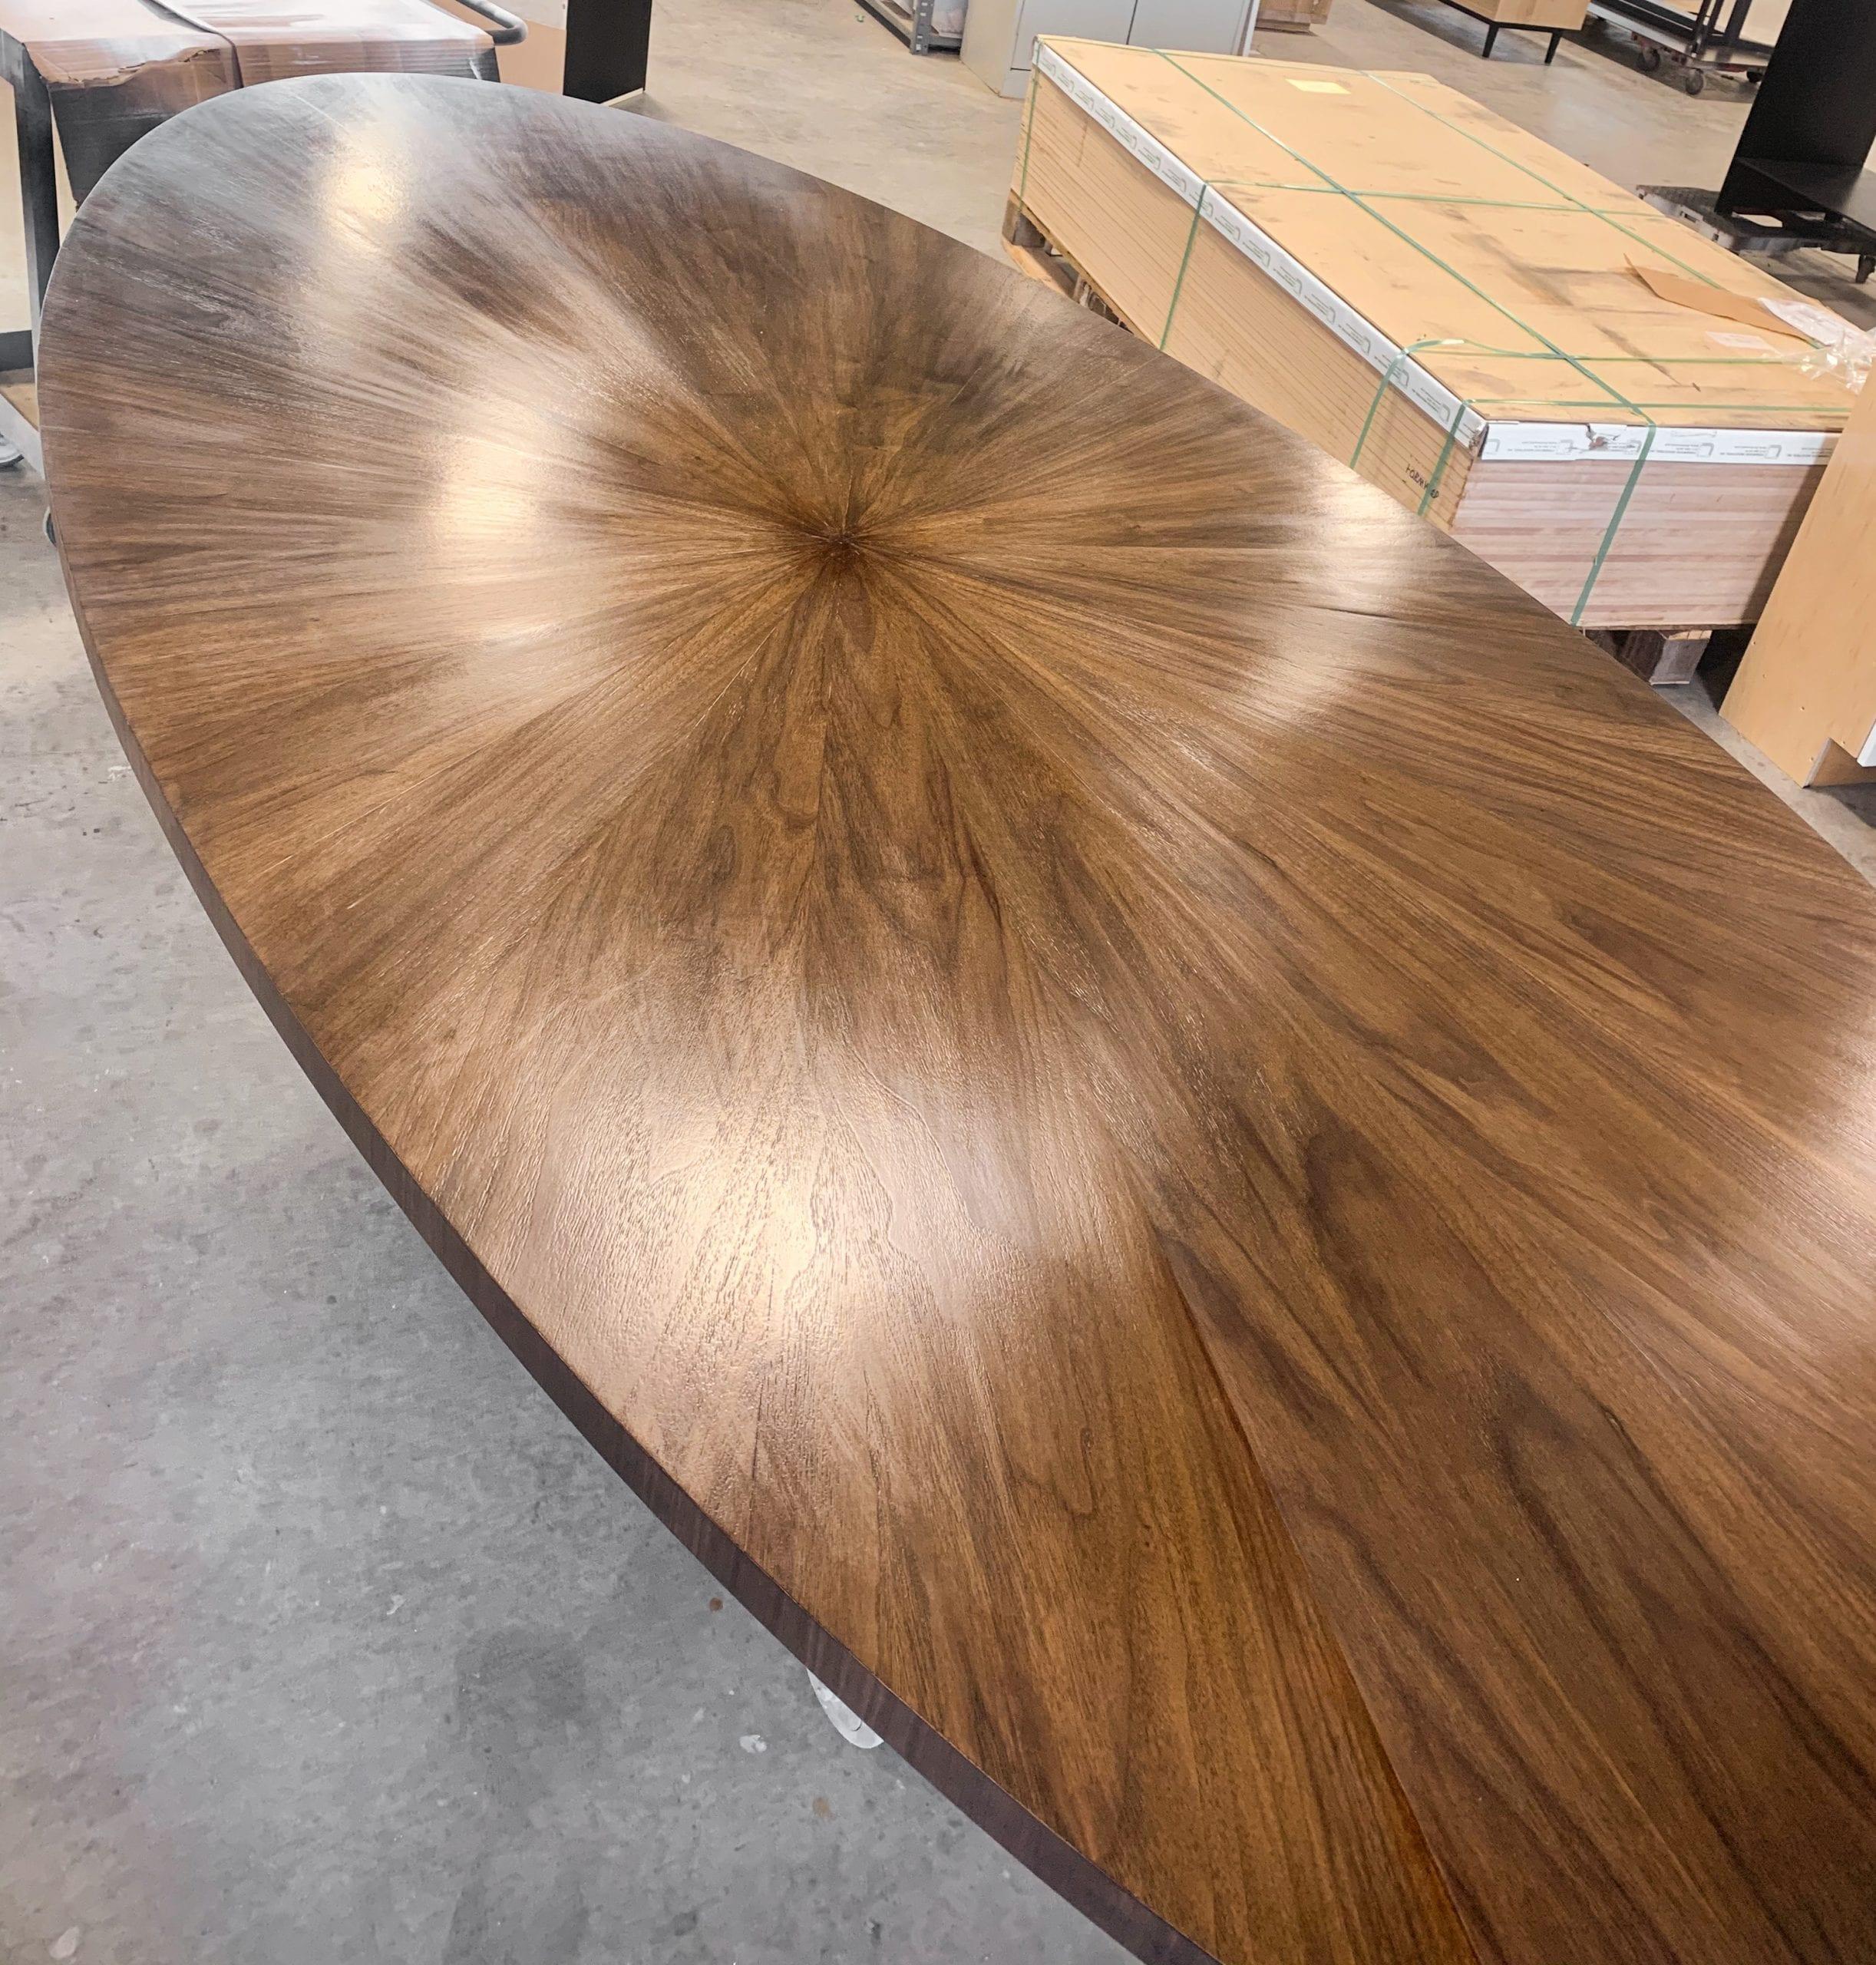 Oval Radiate Table Top Wood Grain